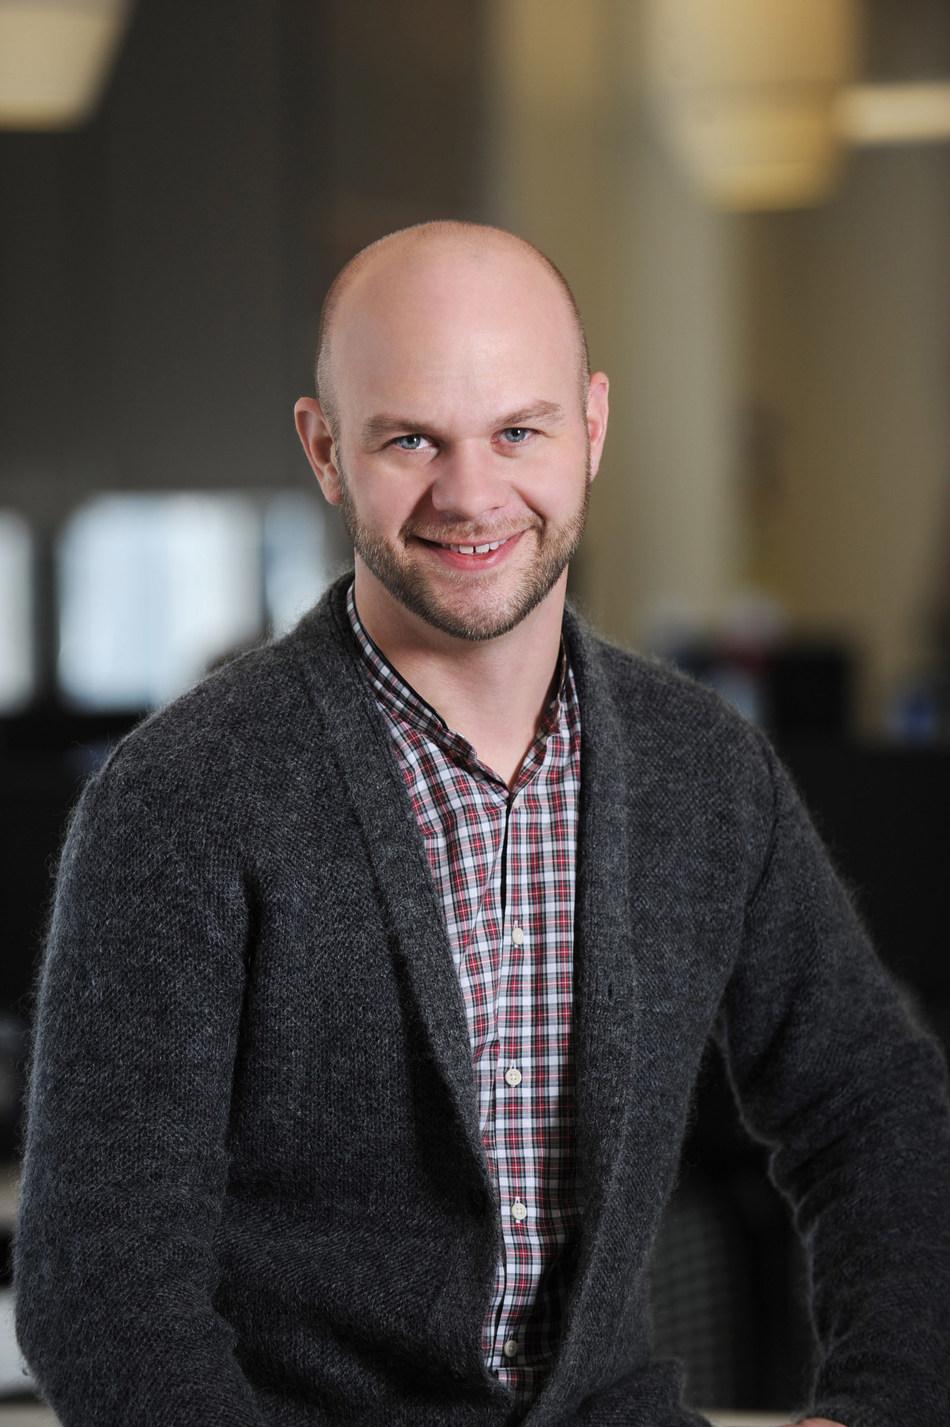 Brian Krick, Global Director of Media Planning, Essence